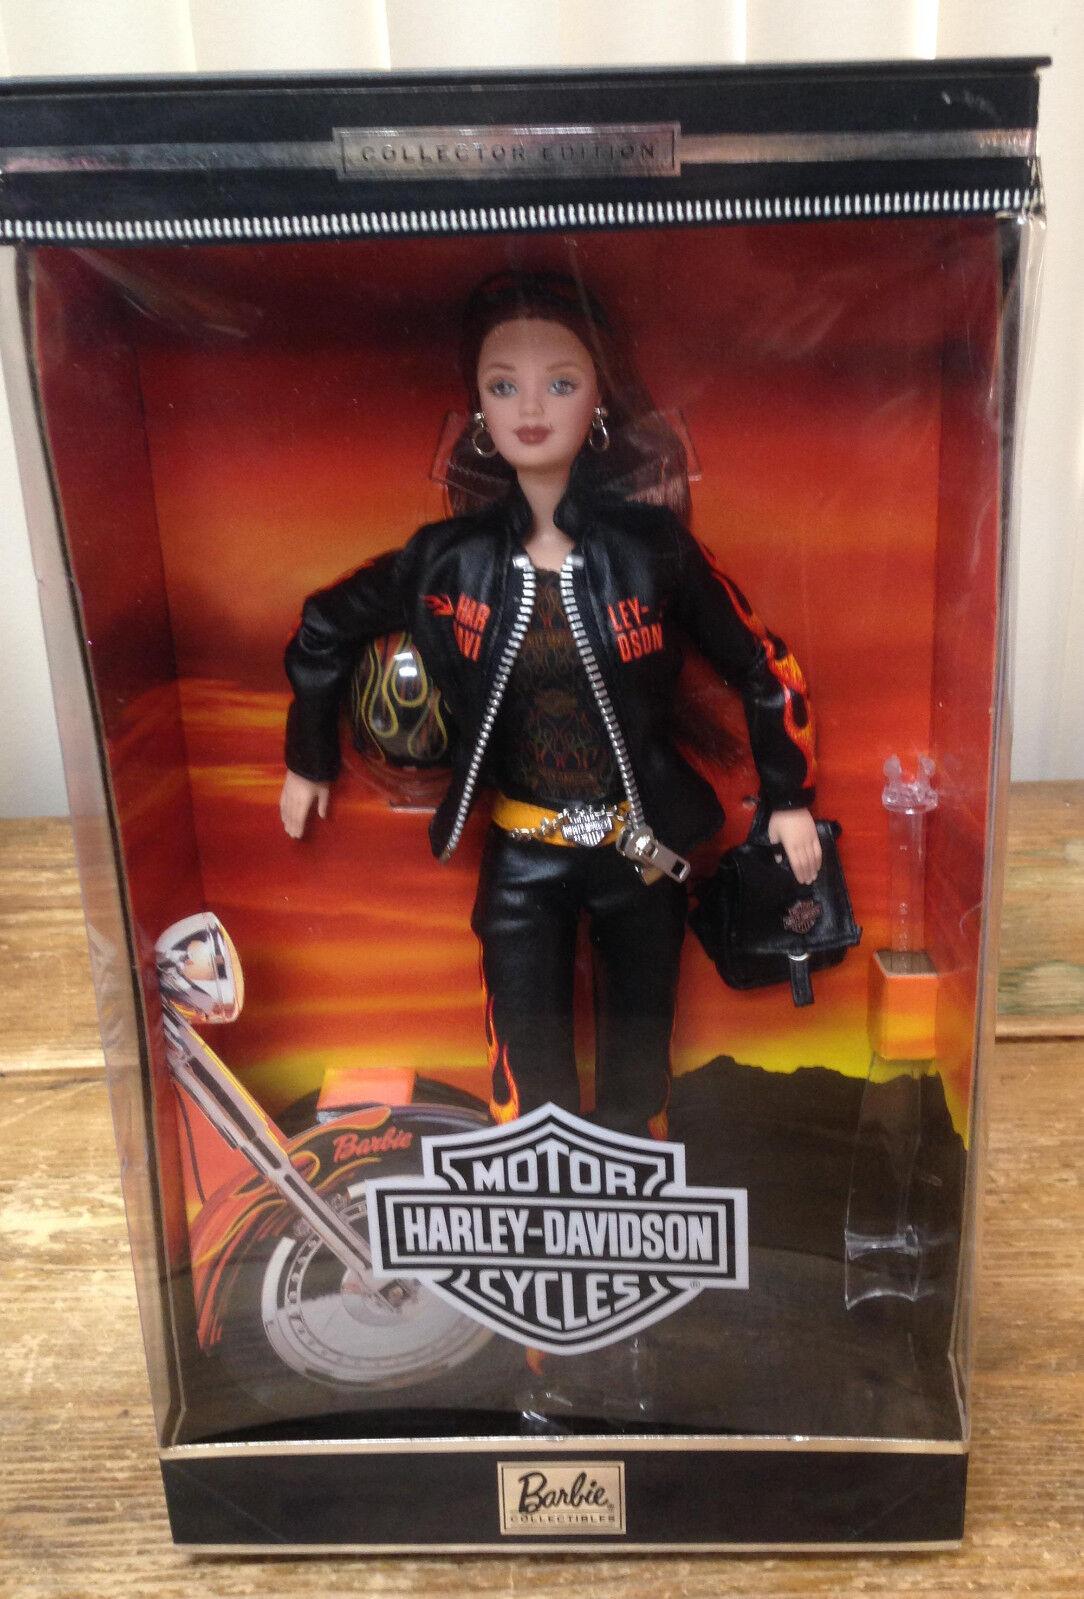 Harley-Davidson Barbie 5 2001 Puppe Motorrad Motorrad Puppe Brunette Mattel 29207 Neu in Karton 9f5e4d